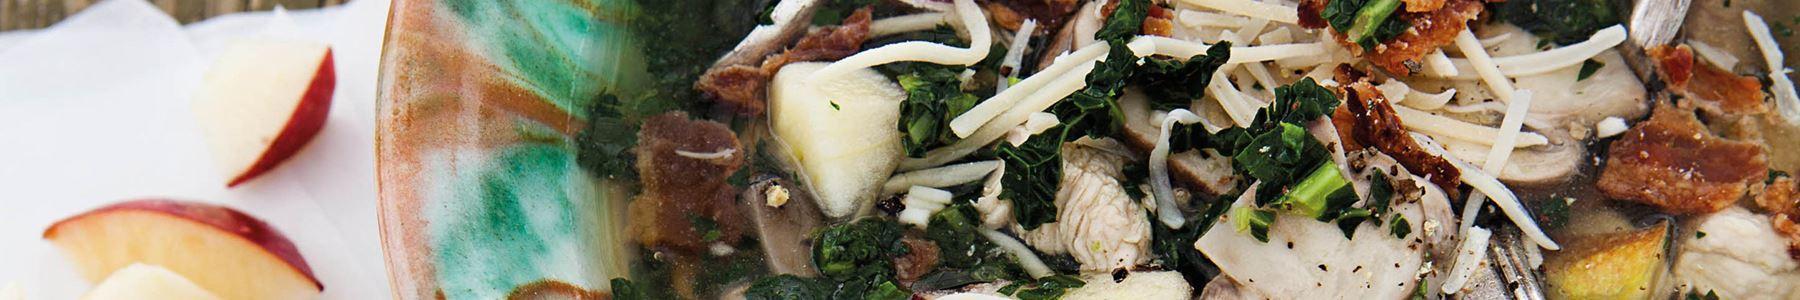 Grønkål + Varme supper